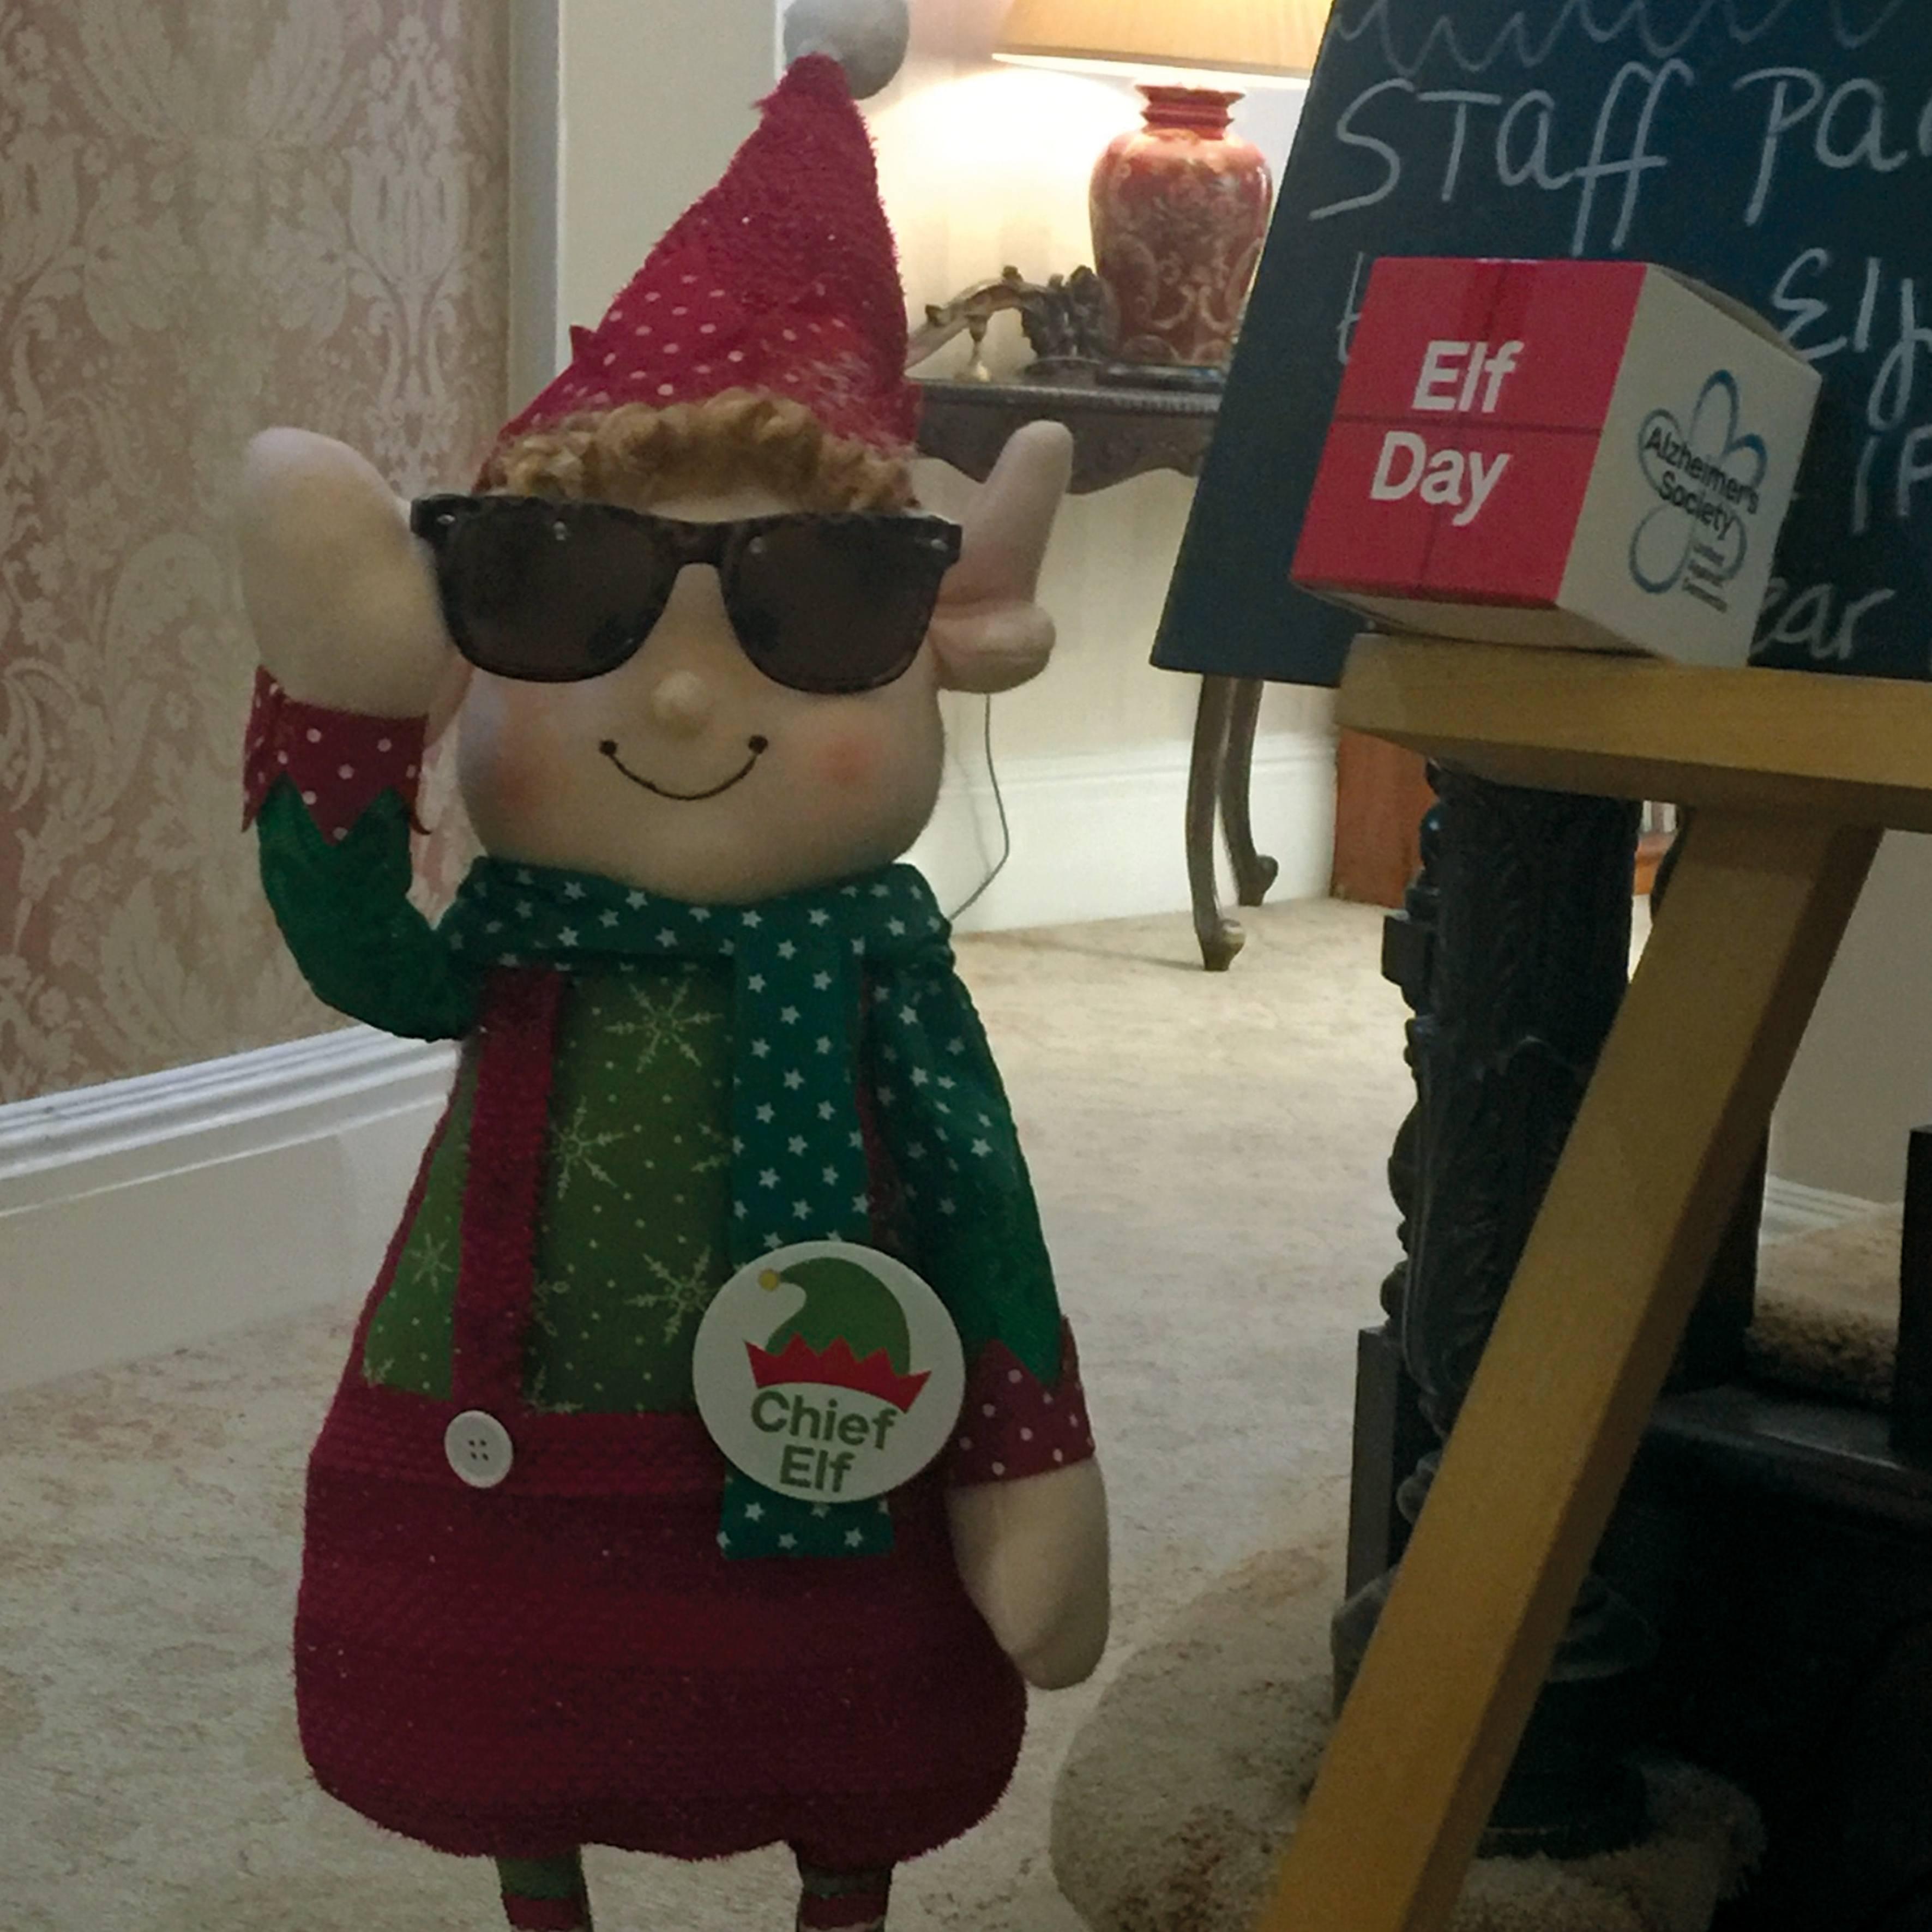 Blackbrook House's Chief Elf